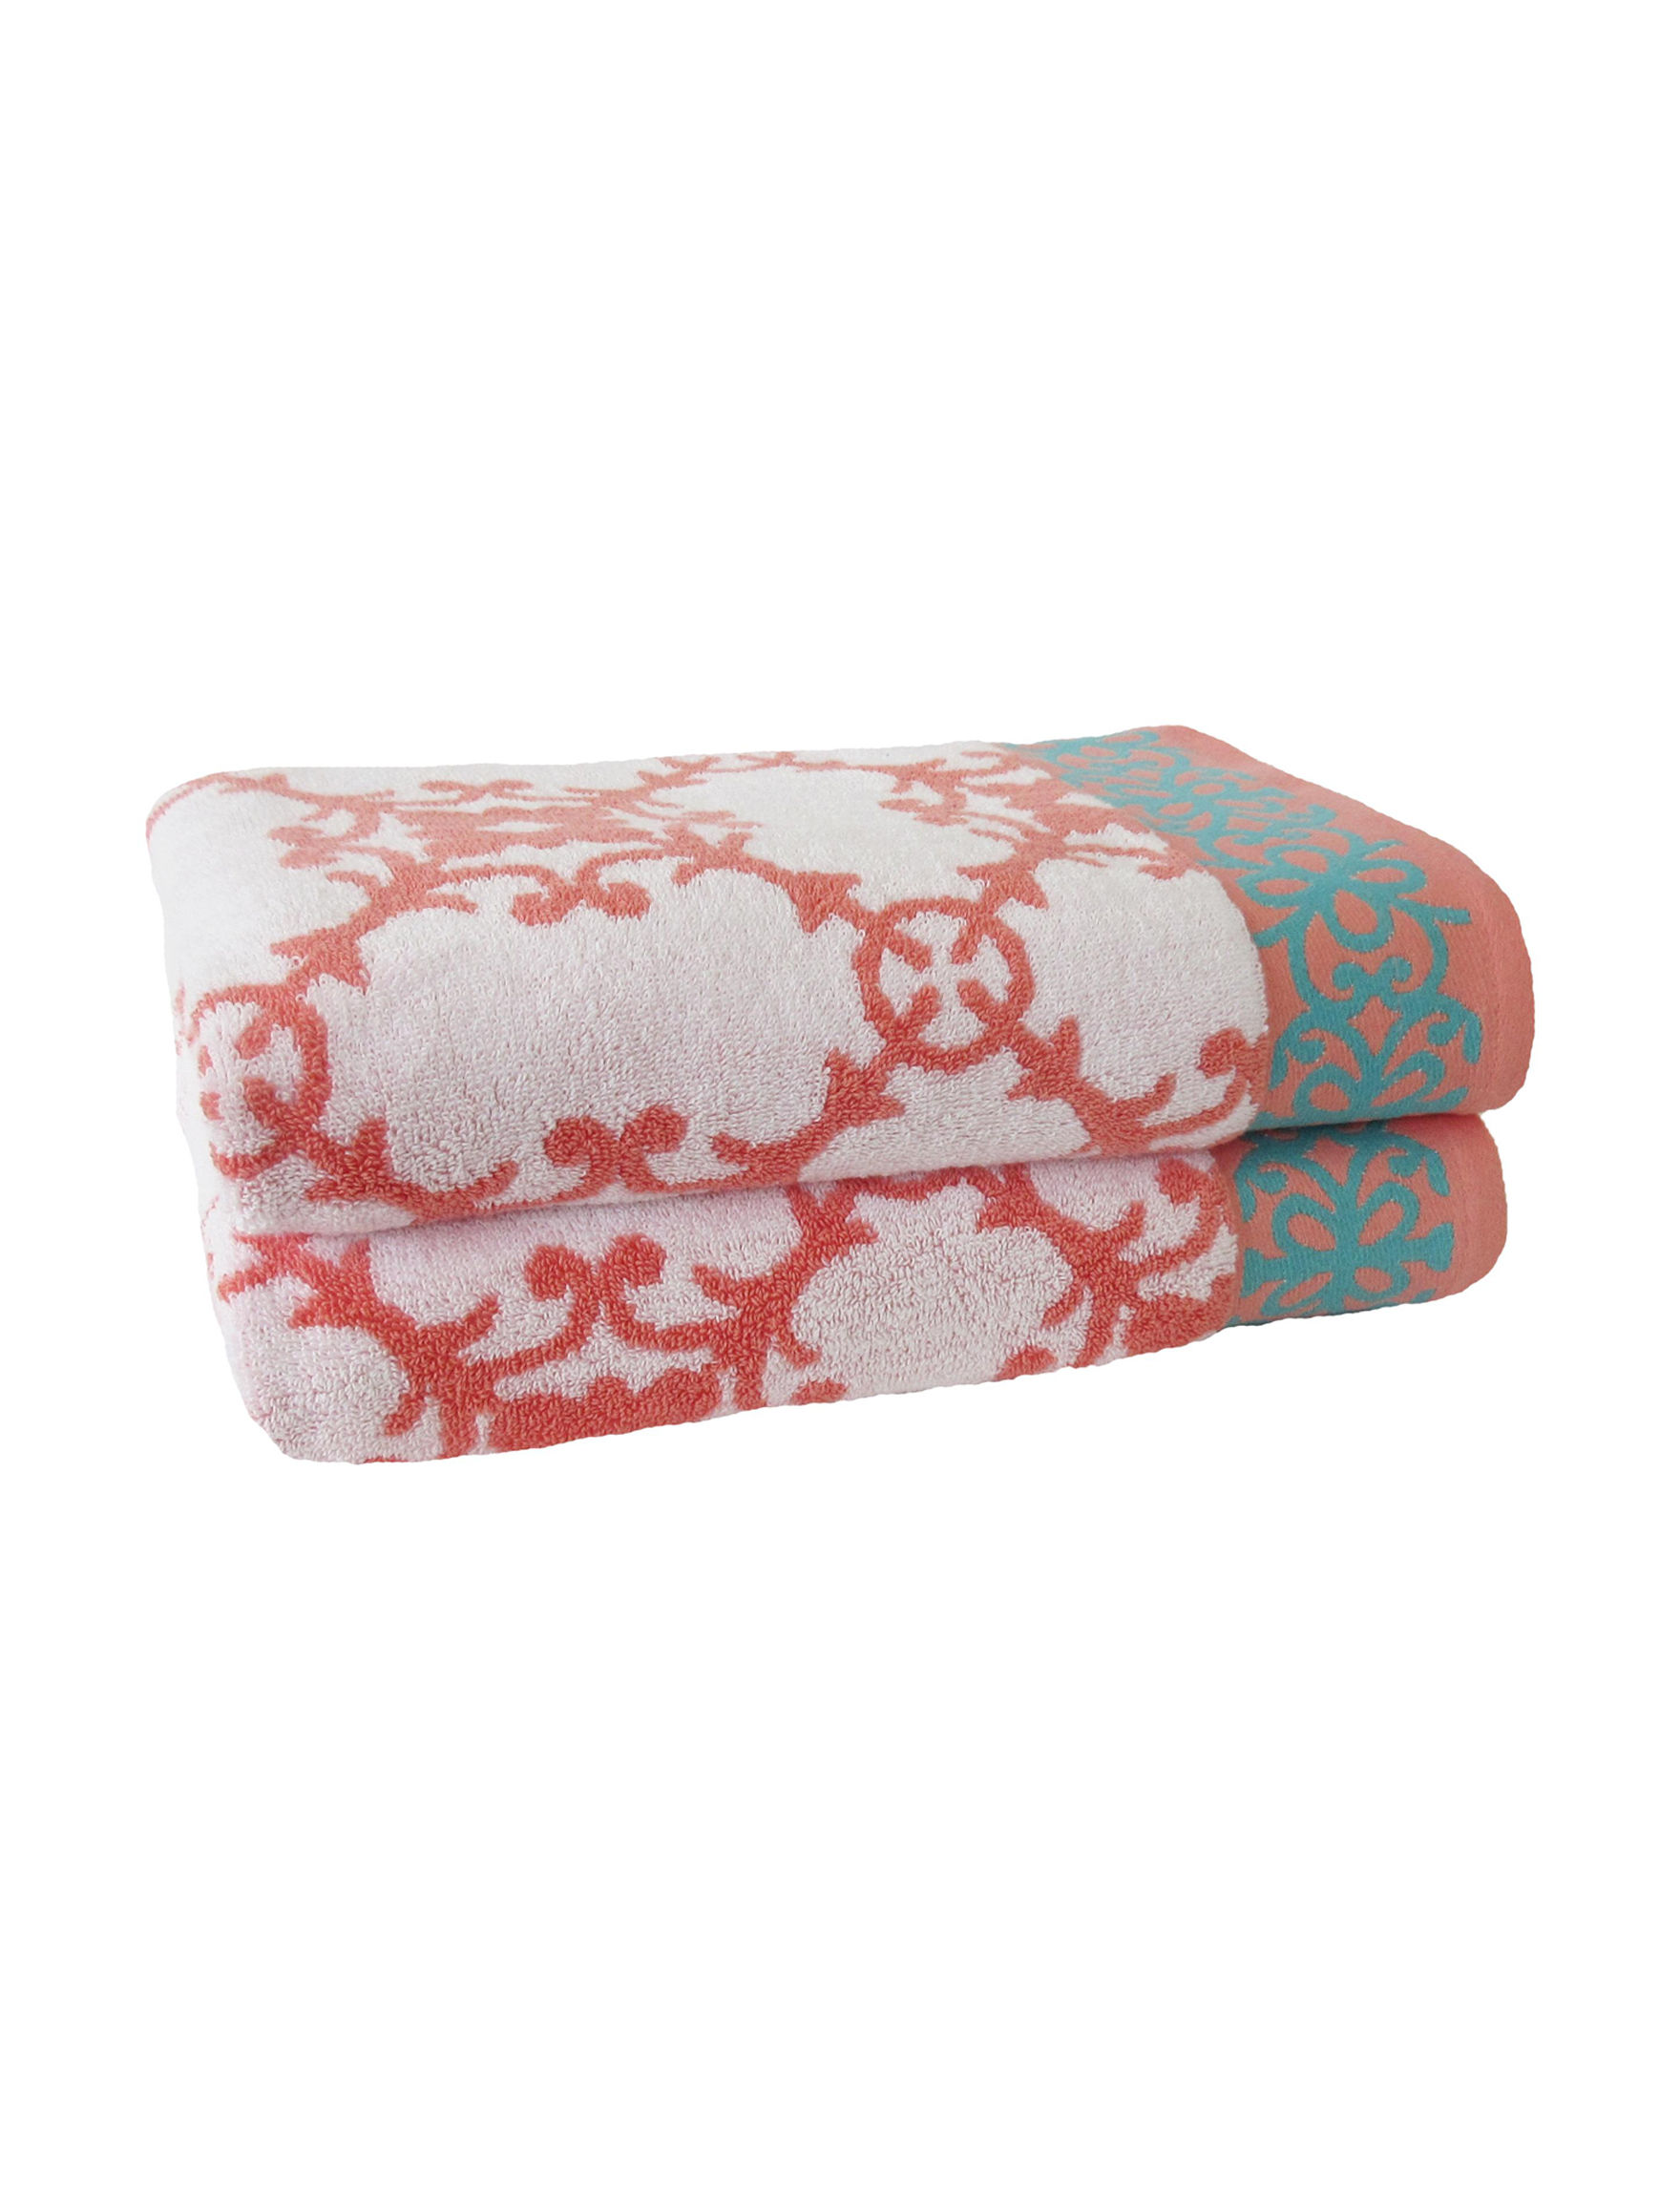 Jessica Simpson Orange Bath Towels